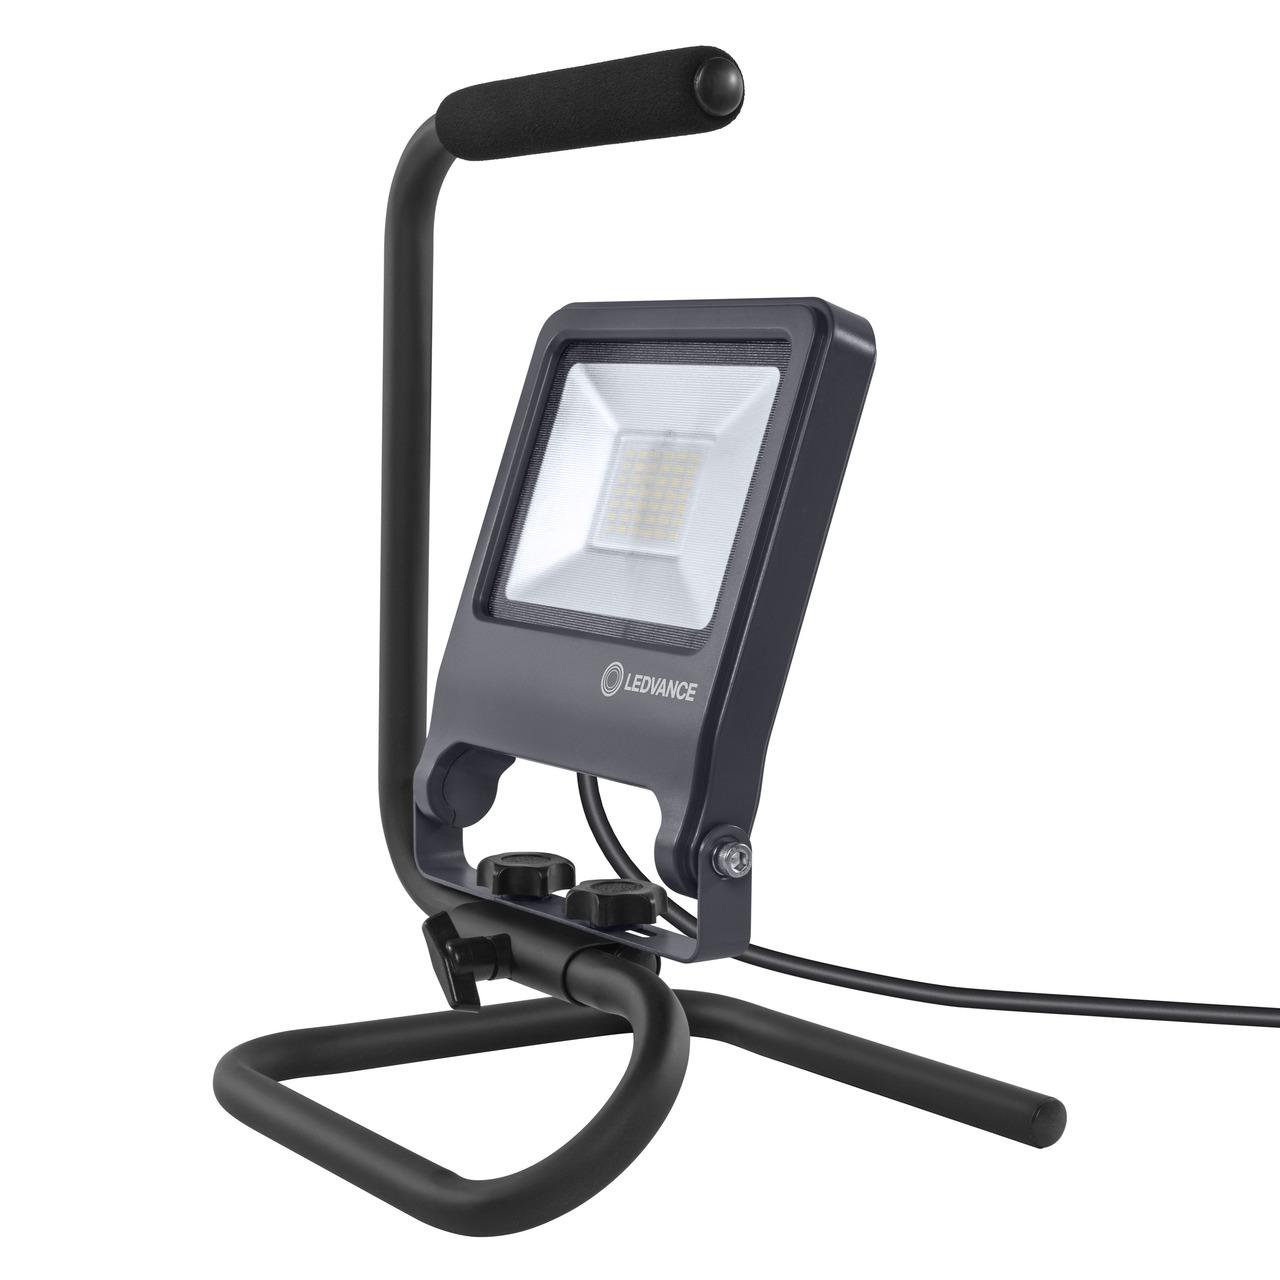 Ledvance 50-W-LED-Arbeitsleuchte Worklight S-STAND- 4500 lm- 4000 K- schwarz- IP65